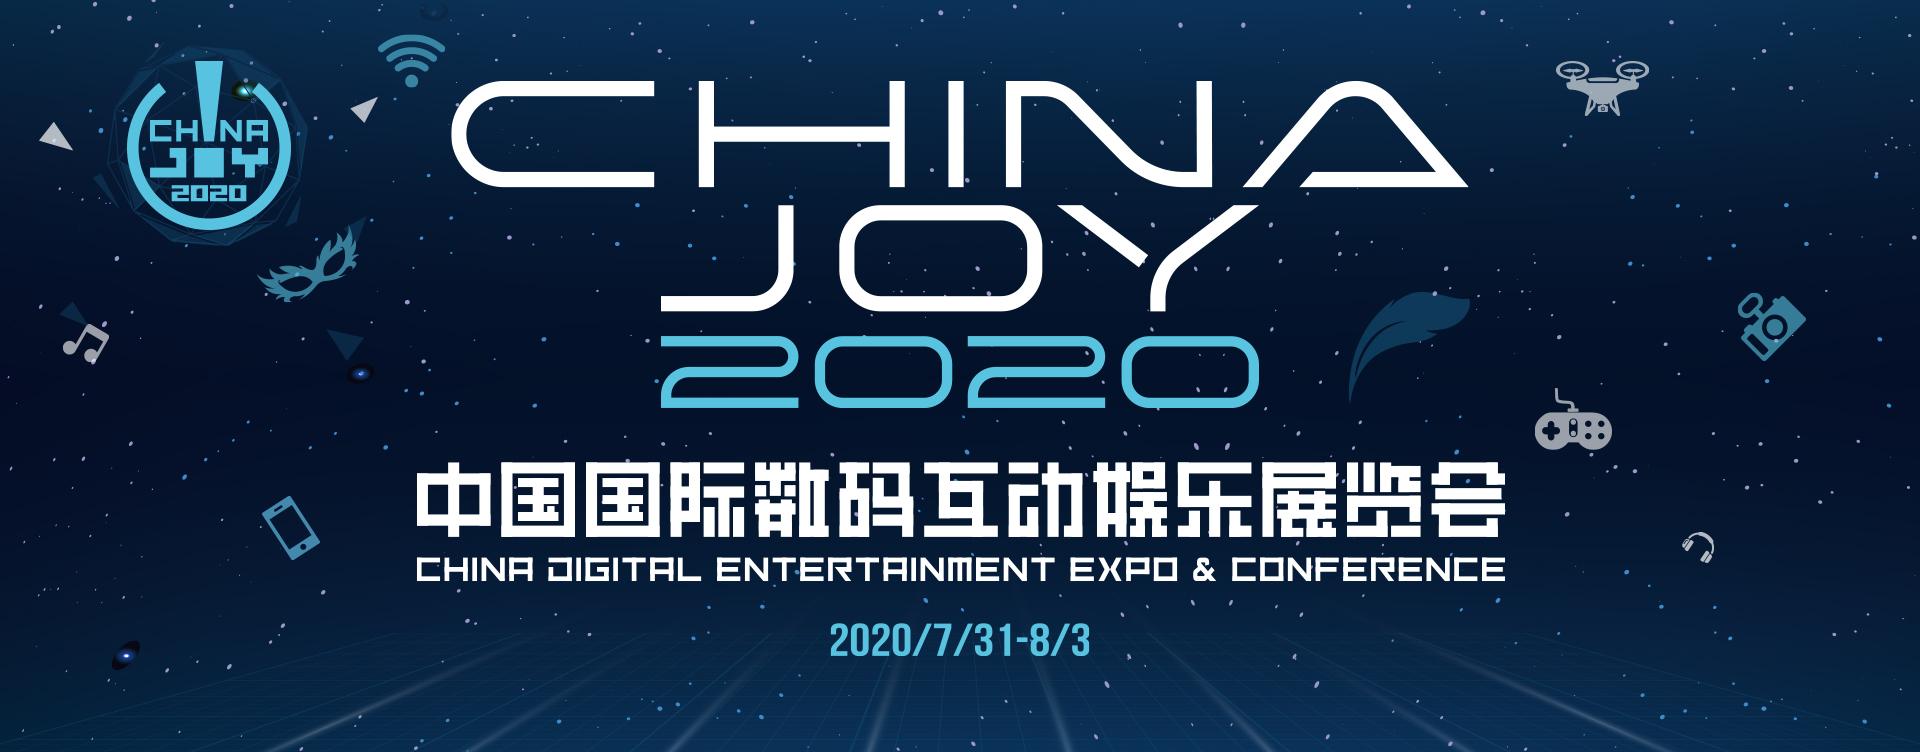 ChinaJoy2020-中国国际数码互动娱乐展览会